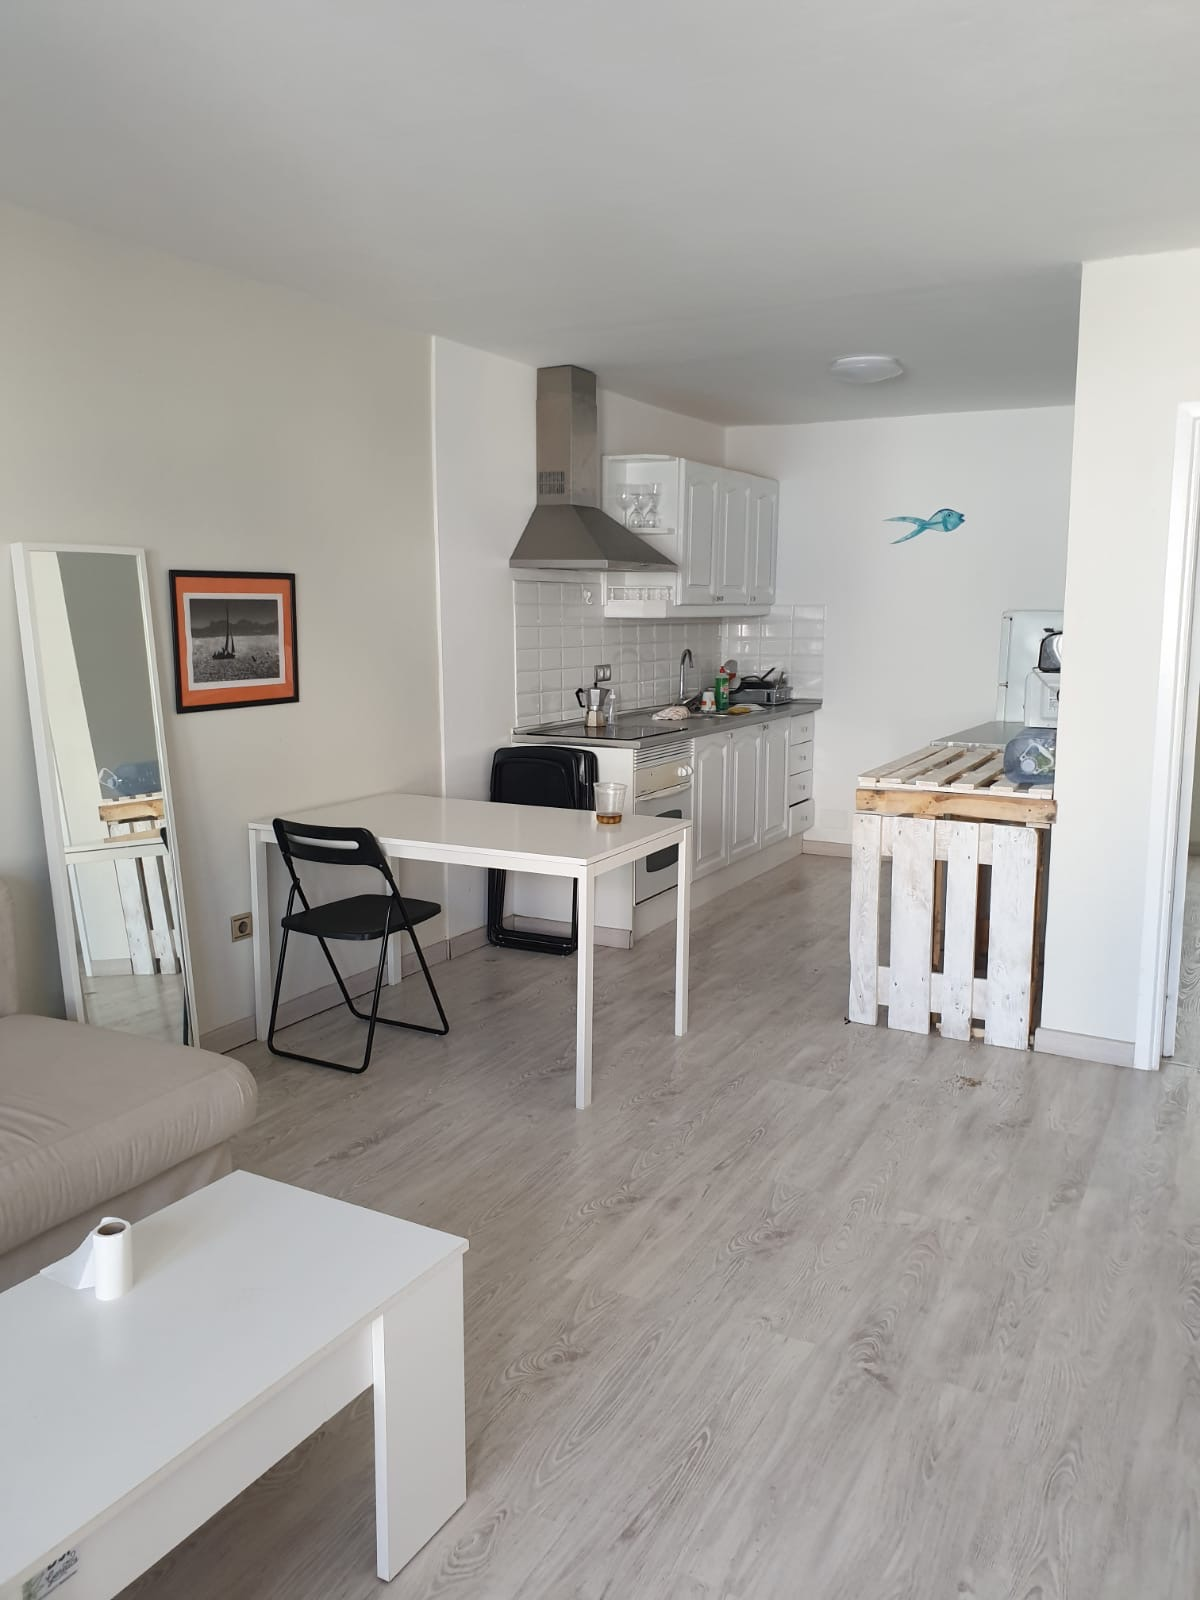 Apartment for Rent in Cotillo en calle Pedro Cabrera Saavedra s/n